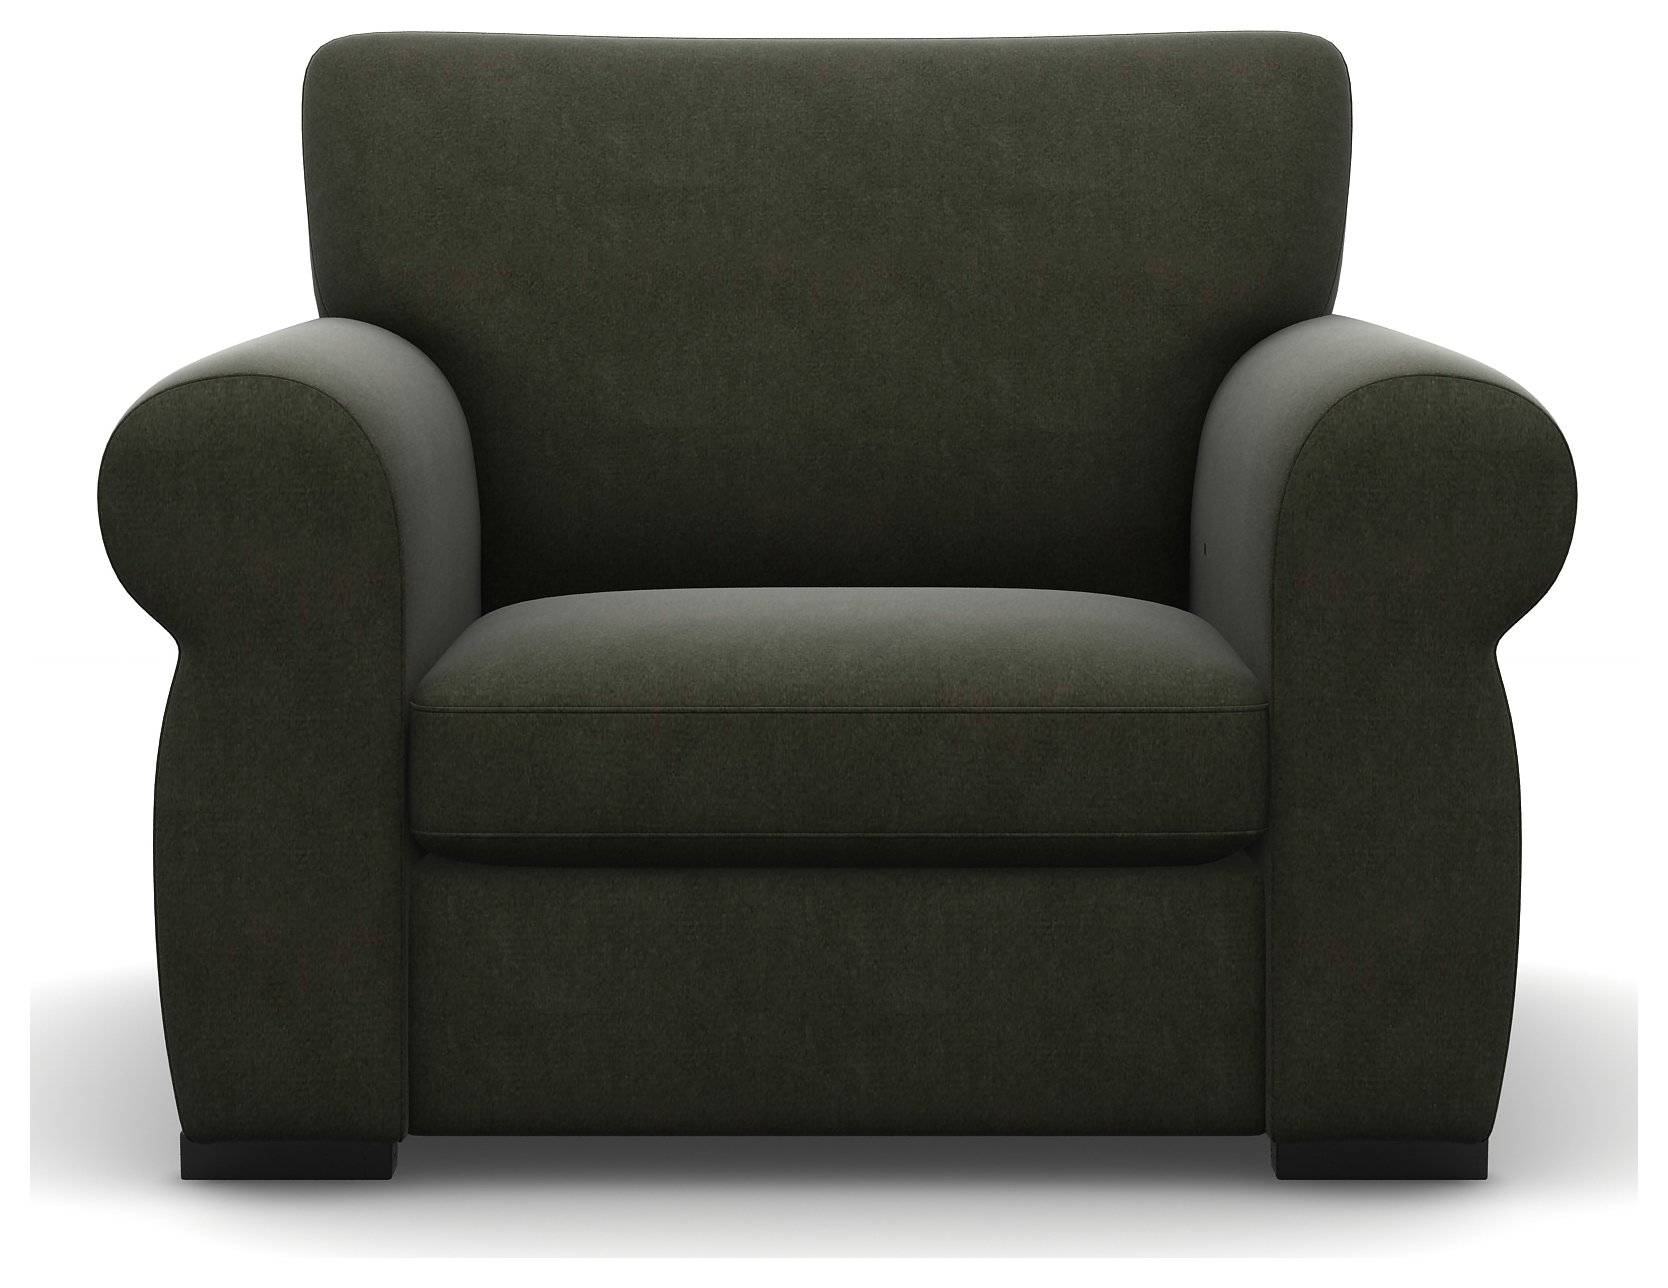 Heart of House Chloe Fabric Chair - Slate.